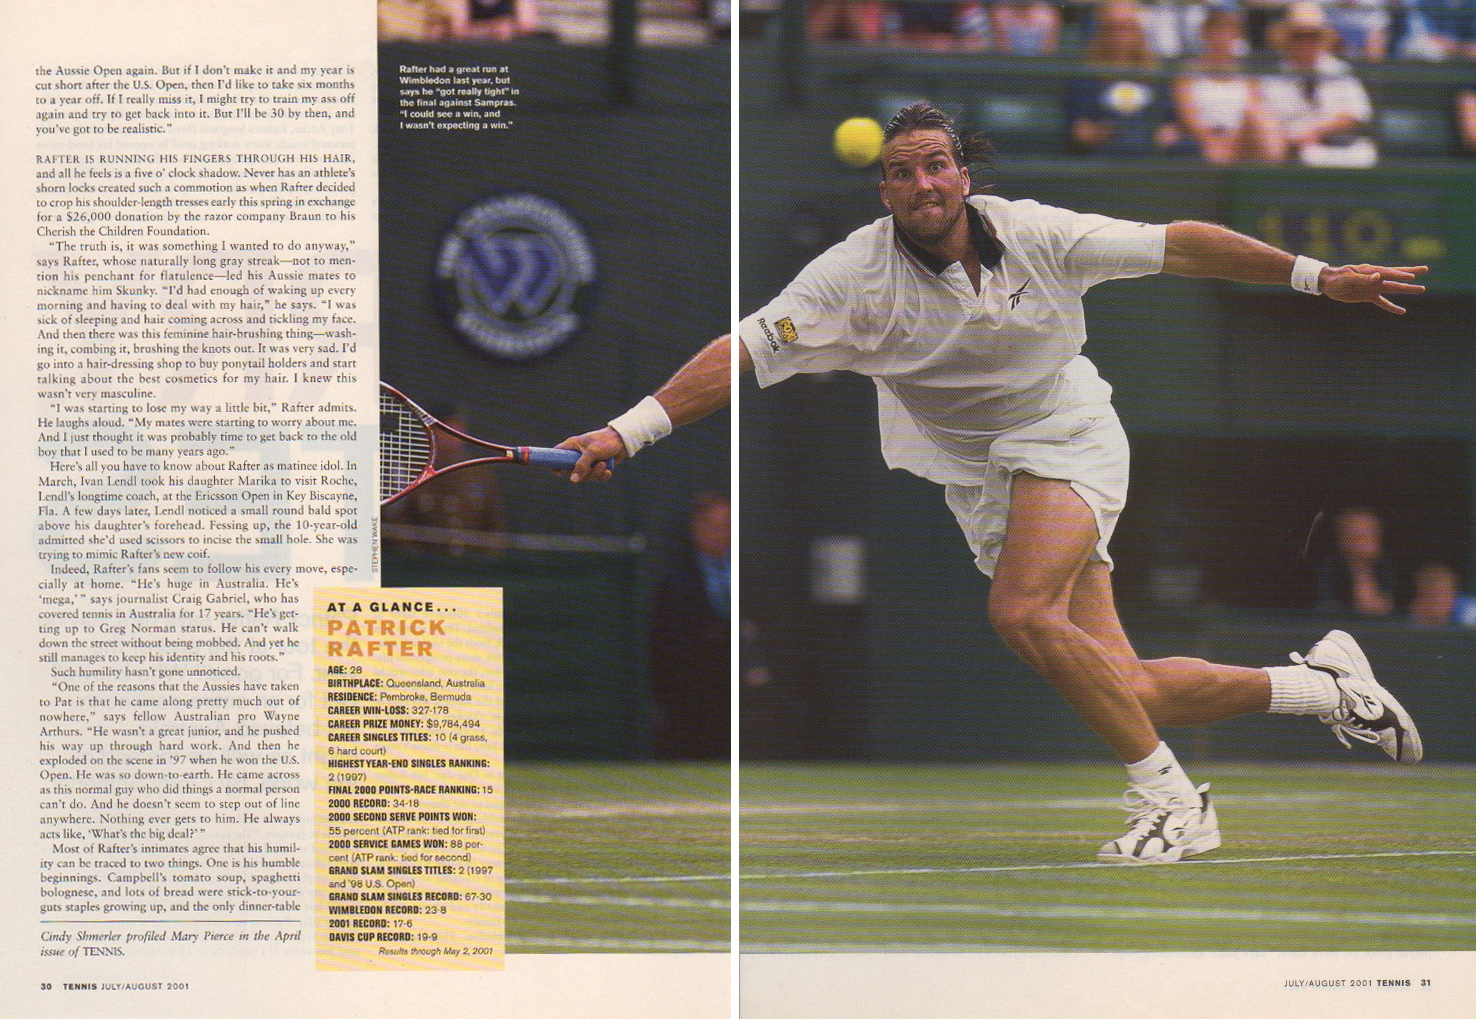 Tennis Magazine, Assistant Art Director  design, art direction